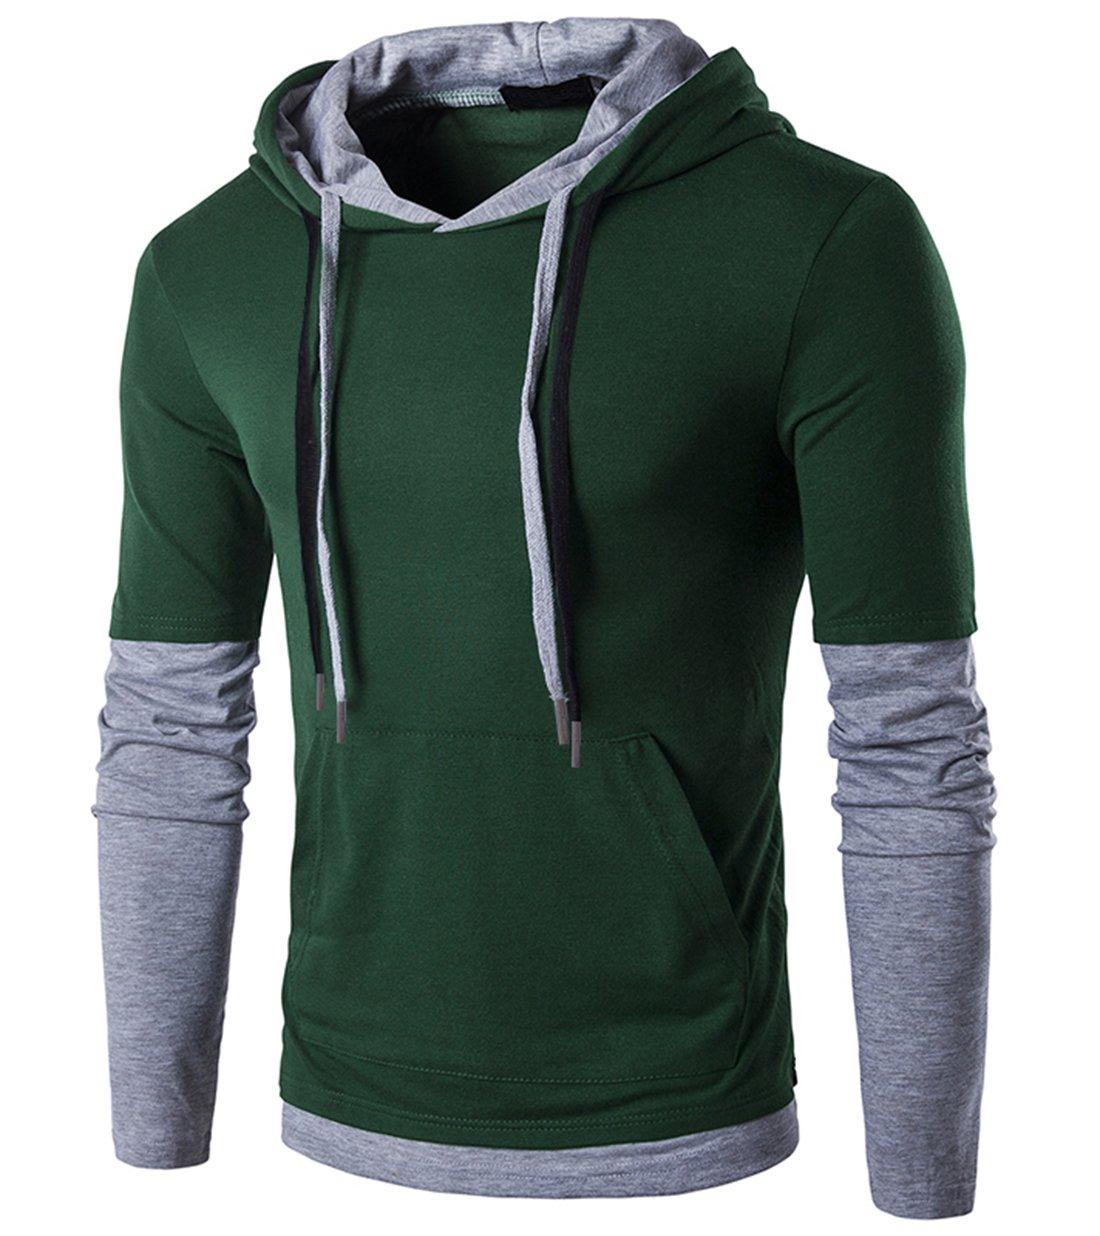 SIR7 Men's Stylish Hooded T Shirt Casual Long Sleeve Hipster Hip Hop Hoodie Shirts Dark Green XL